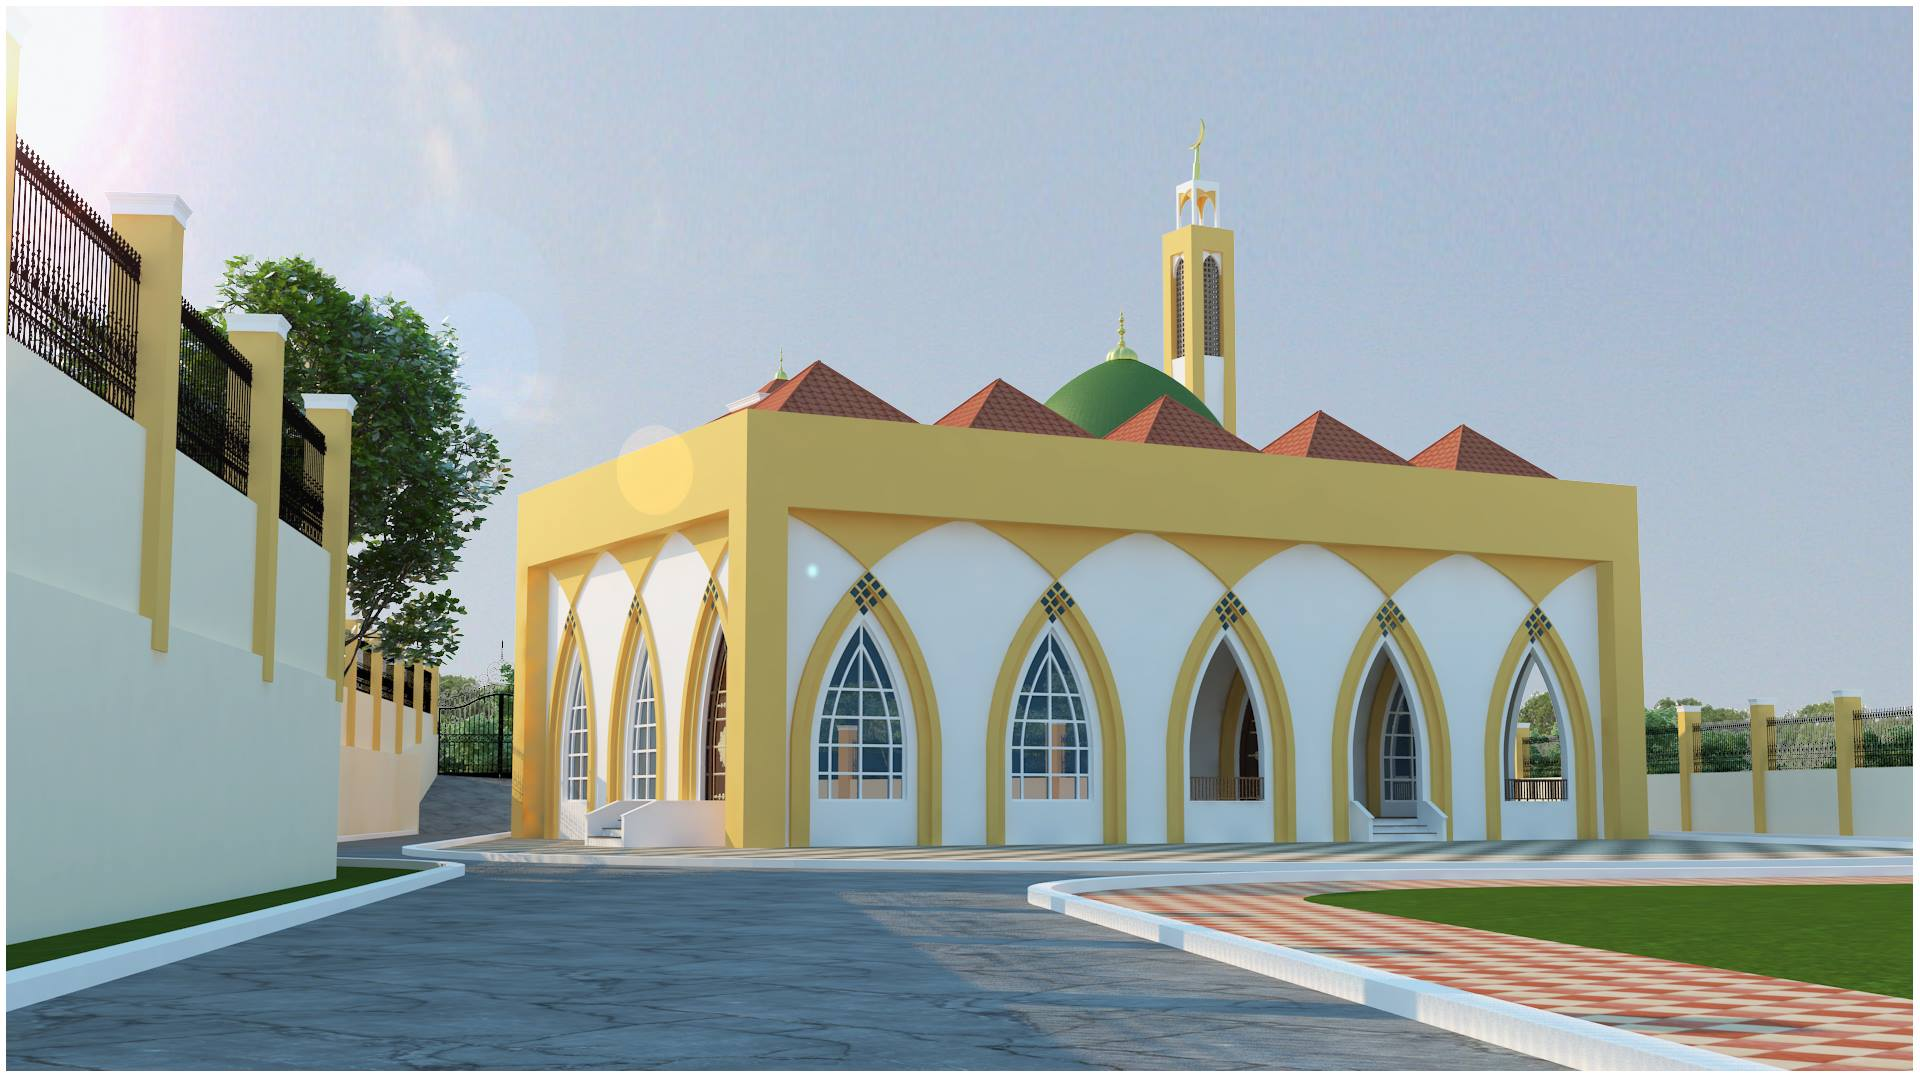 Masjid Al Amal, Tarlac Philippines 3